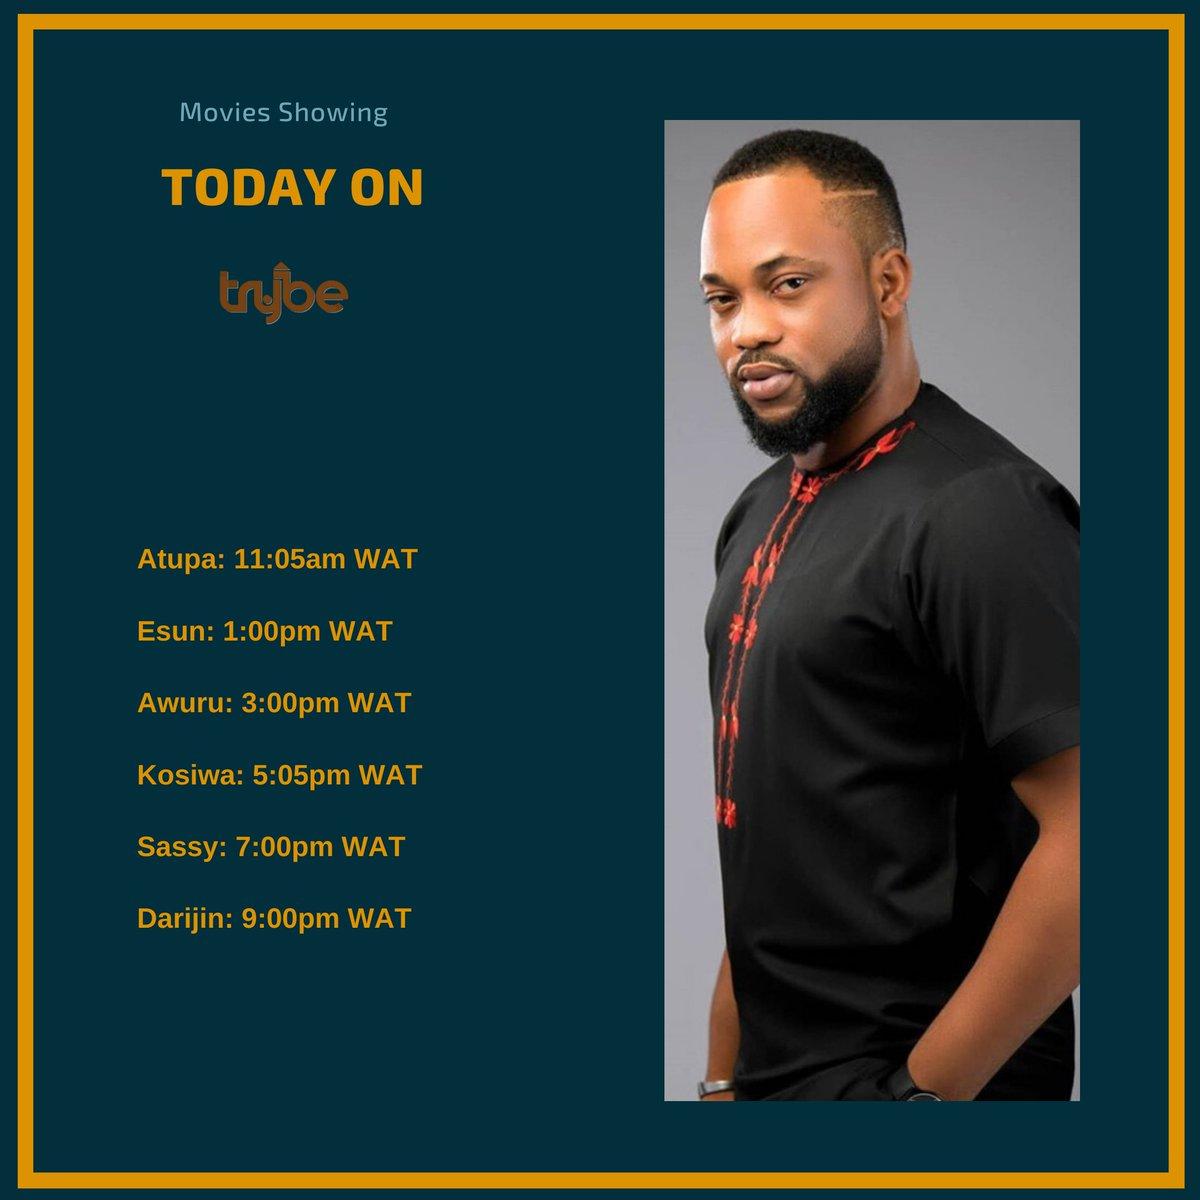 Watch these Yoruba movies today on Trybe:  Atupa: 11:05am WAT Esun: 1:00pm WAT Awuru: 3:00pm WAT Kosiwa: 5:05pm WAT Sassy: 7:00pm WAT Darijin: 9:00pm WAT  #trybe #trybetv #gotvch97 #dstvch195 #nollywood #trends #nollywoodmovies #atupa #esun #awuru #kosiwa #sassy #darijin